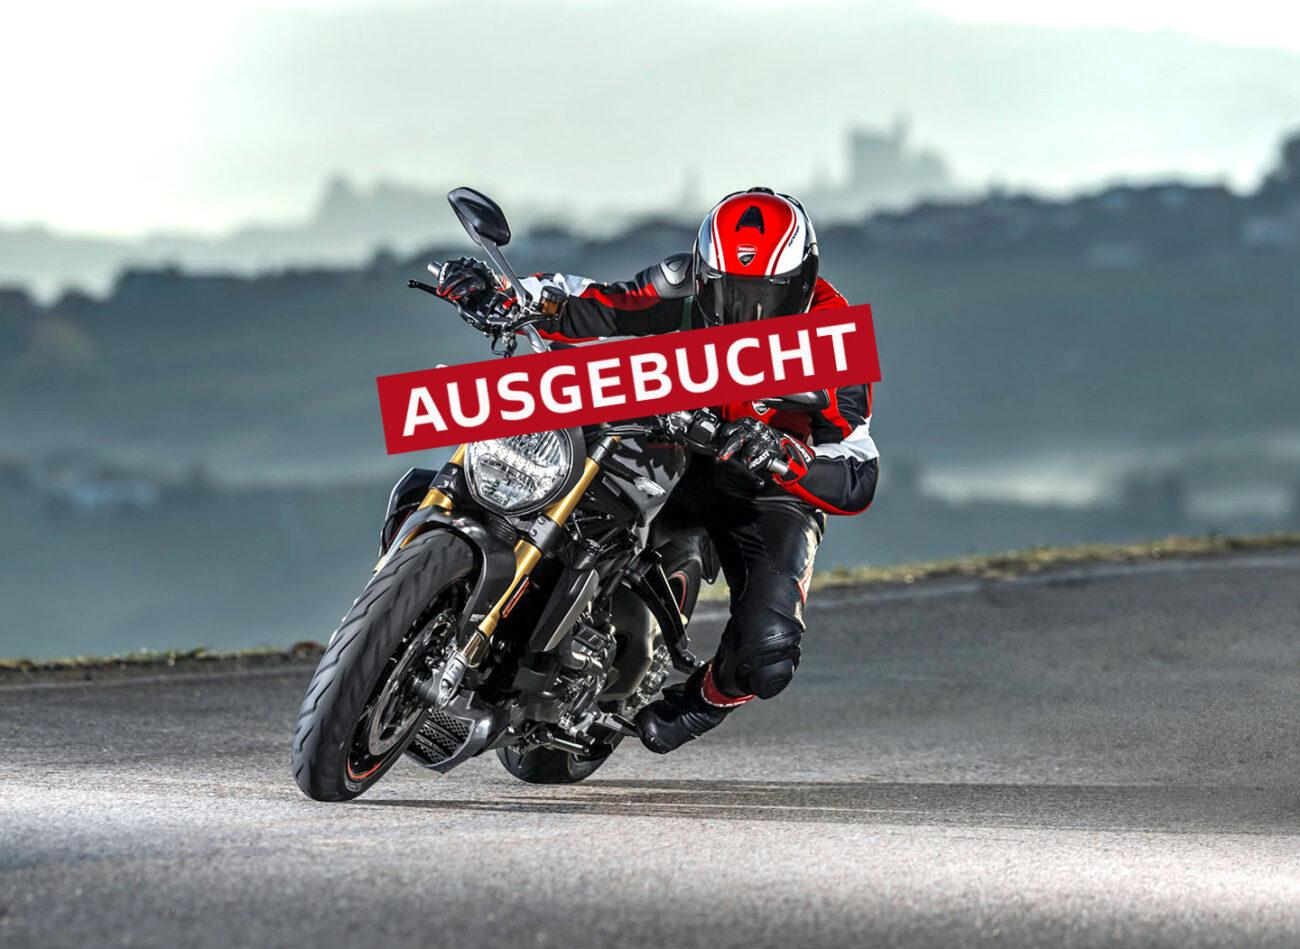 Ducati Berlin Kurventraining ausgebucht